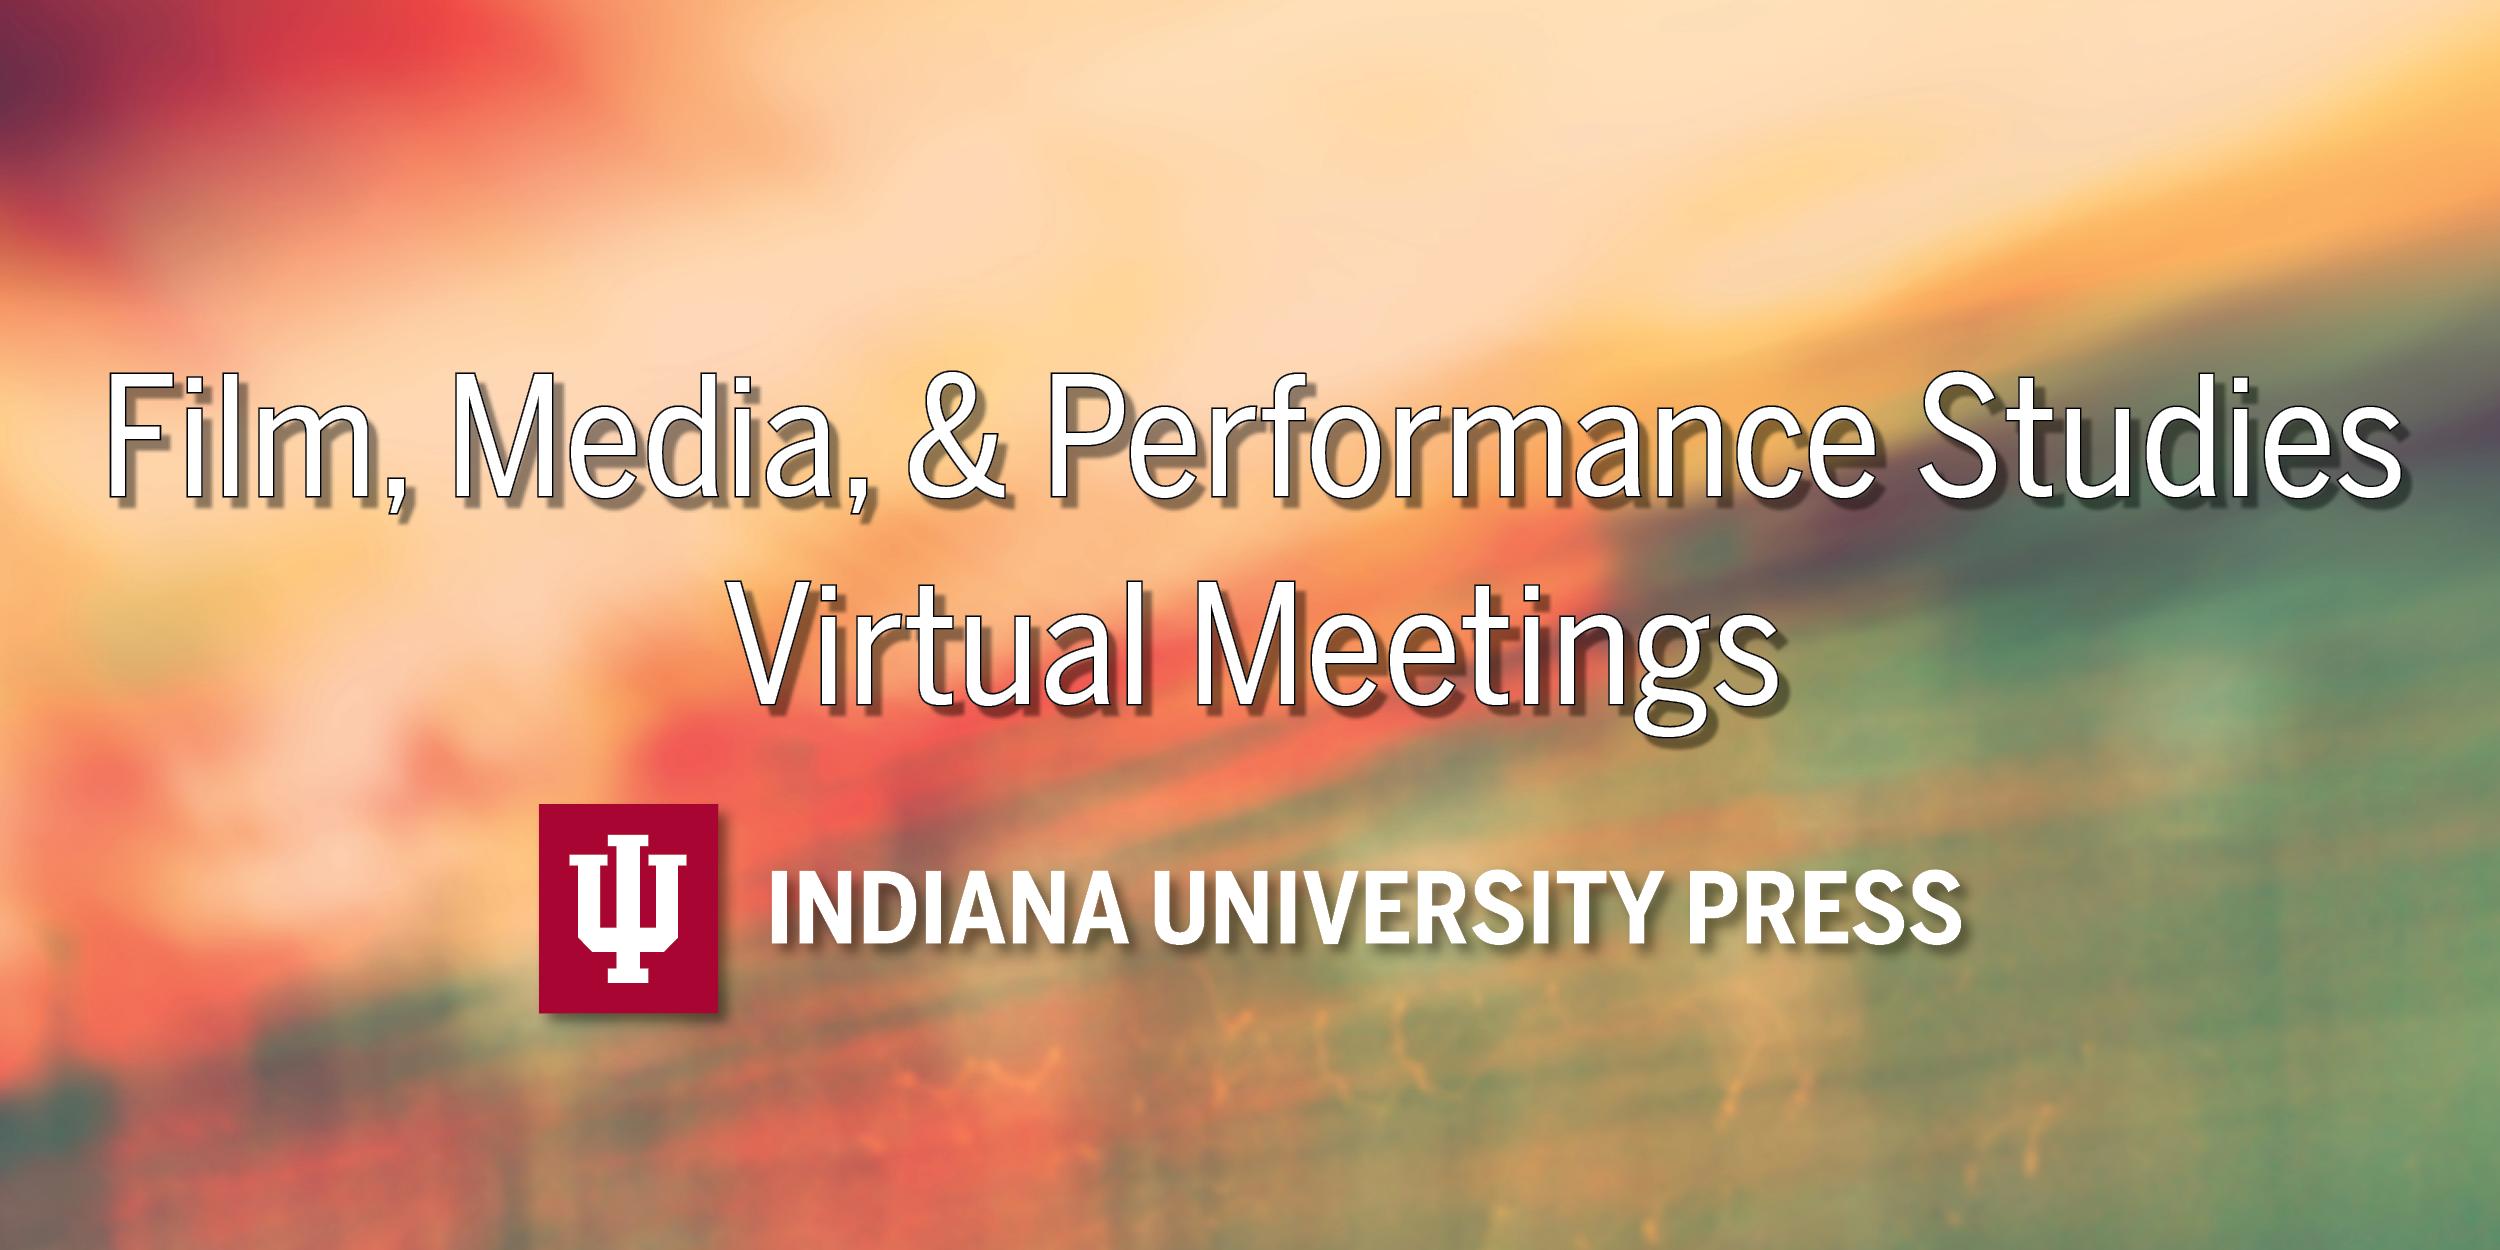 Film, Media, and Performance Studies Virtual Meetings